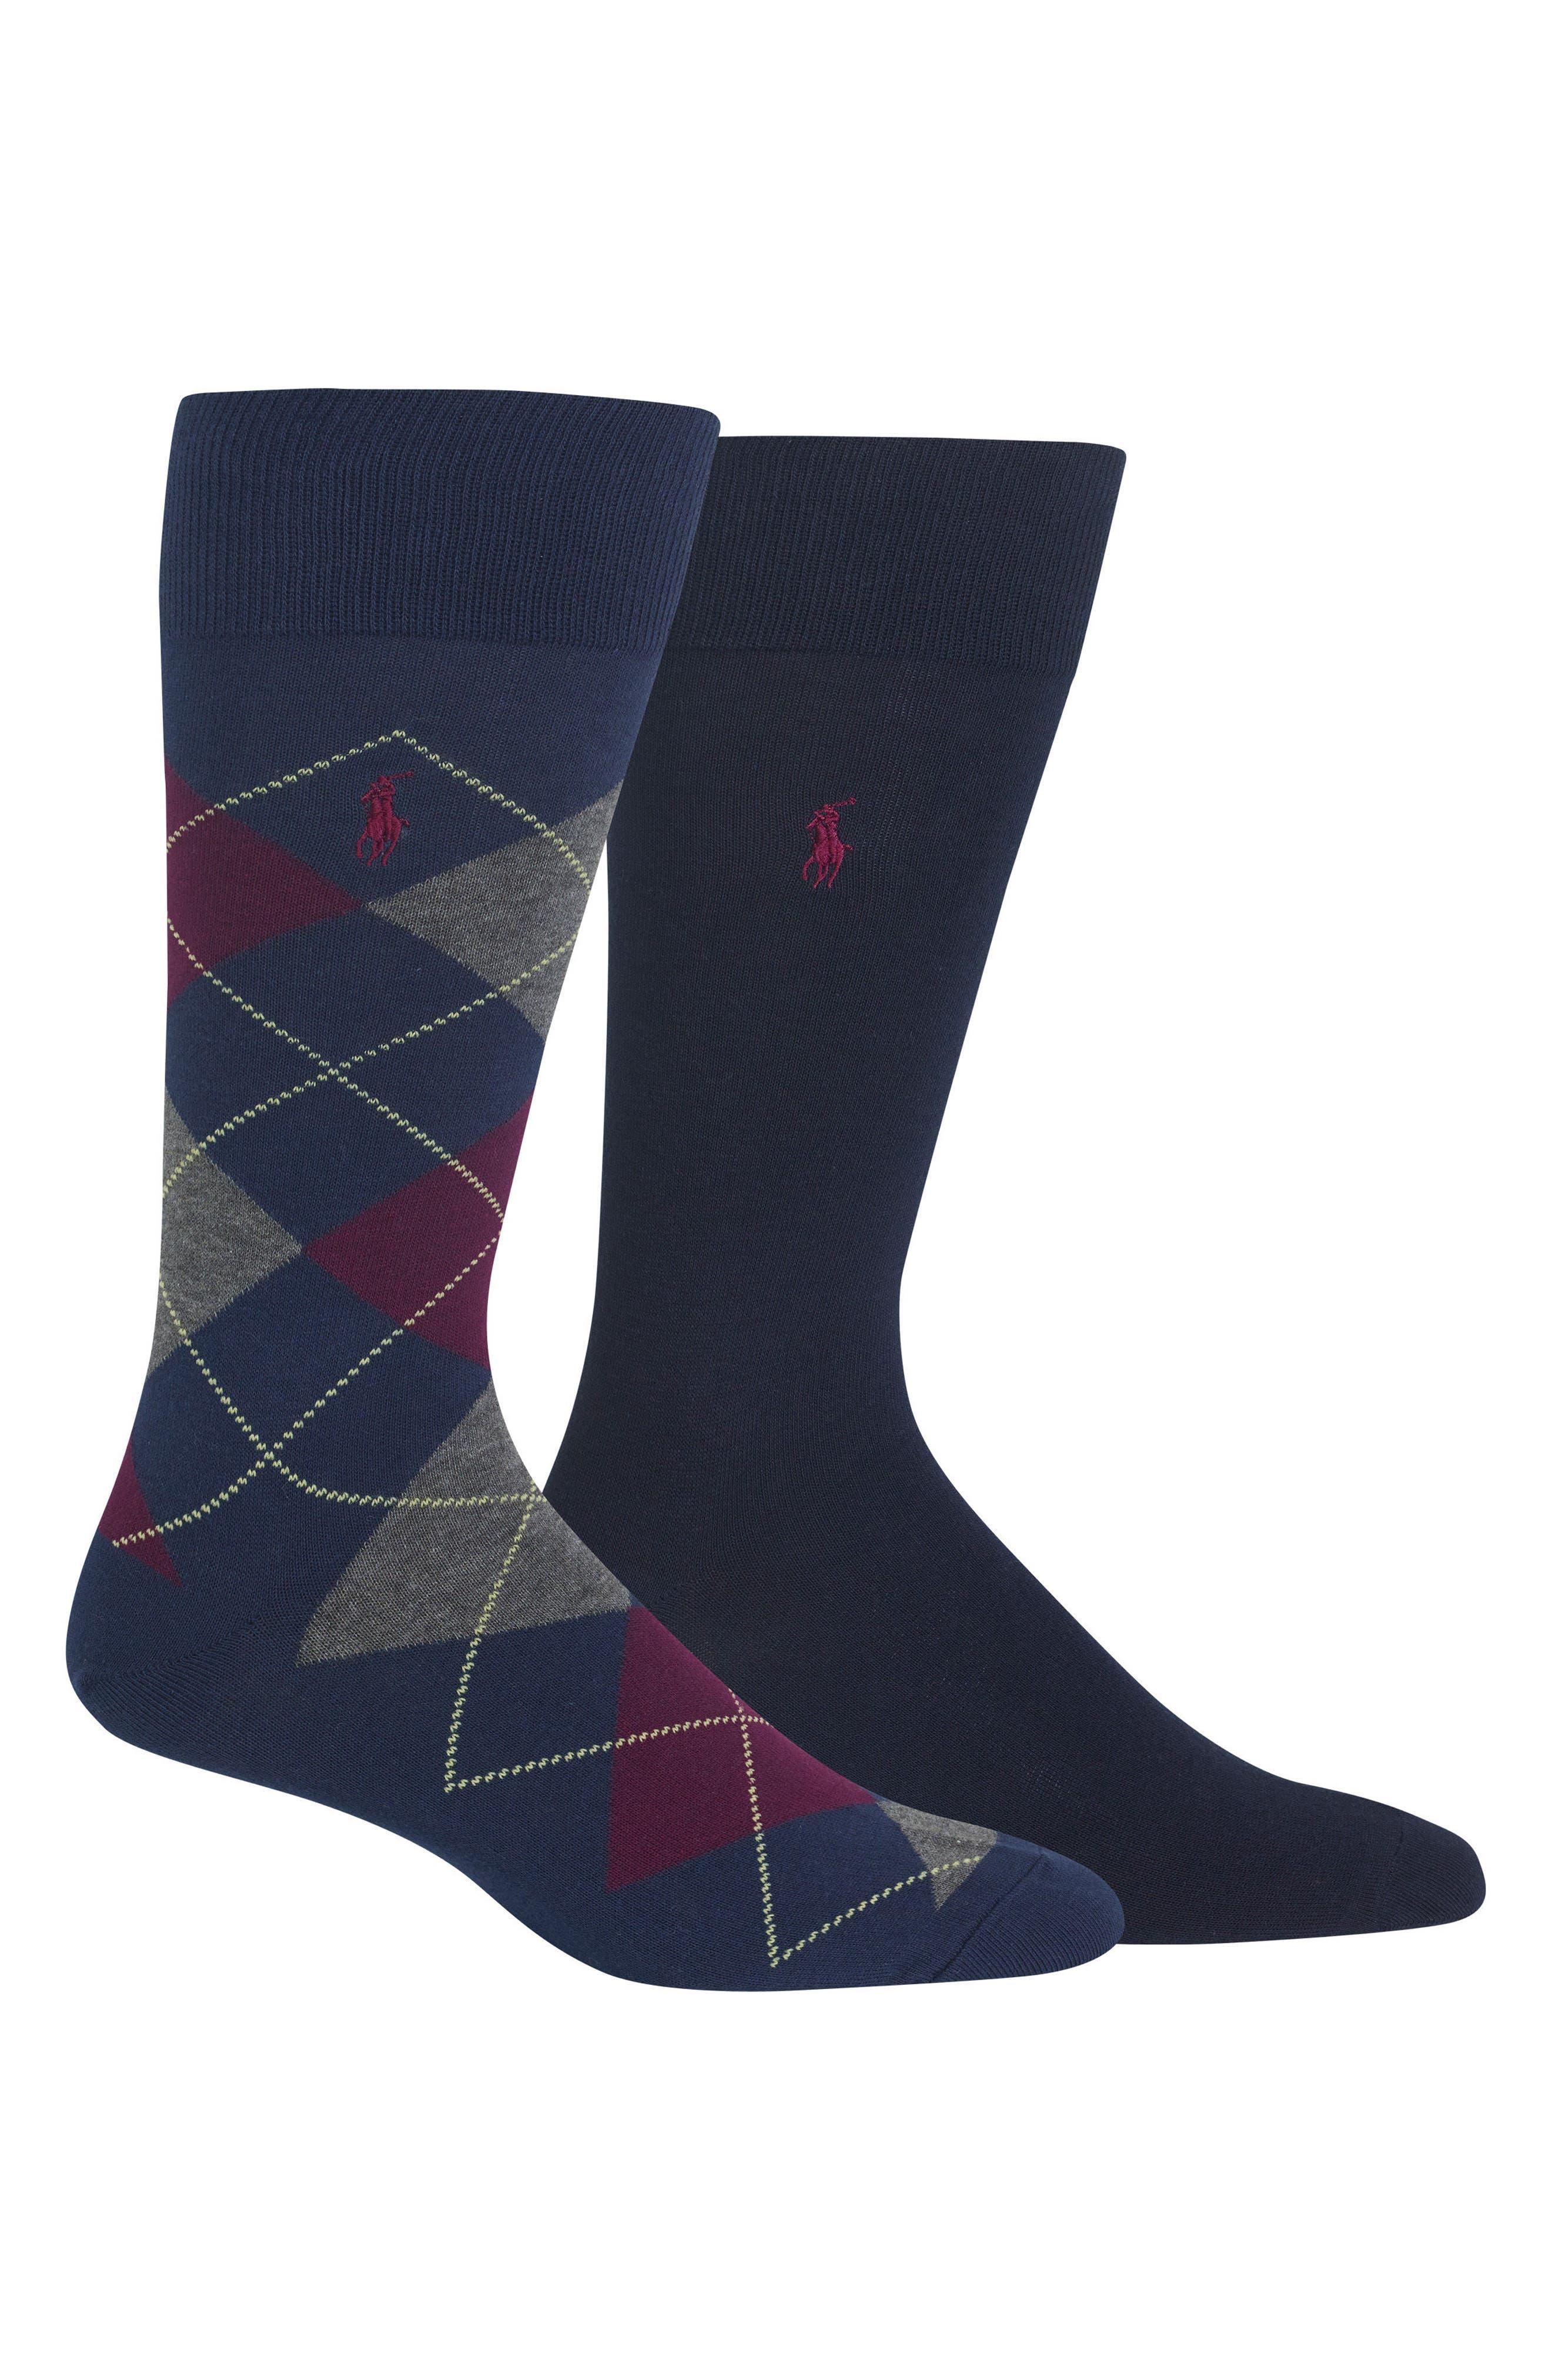 Cotton Blend Socks,                             Main thumbnail 1, color,                             499